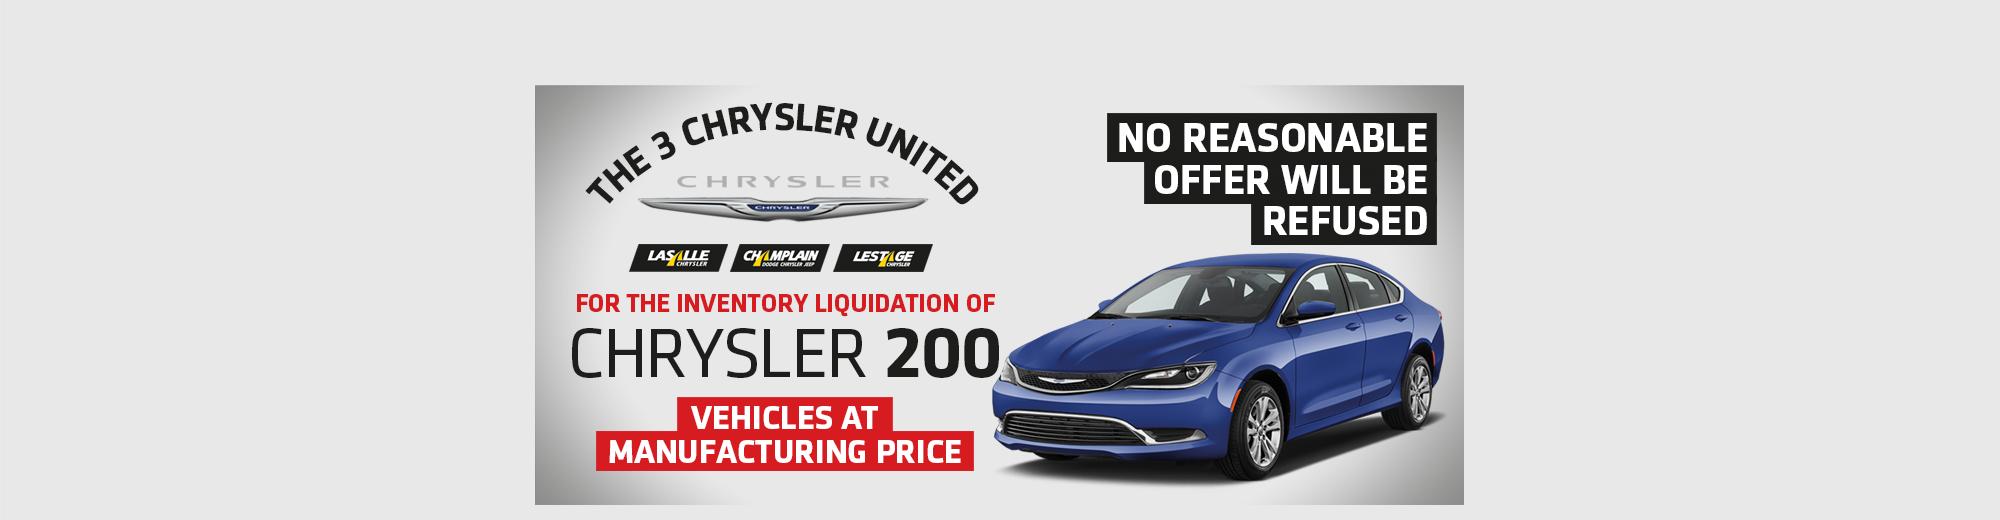 Inventory liquidation of Chrysler 200